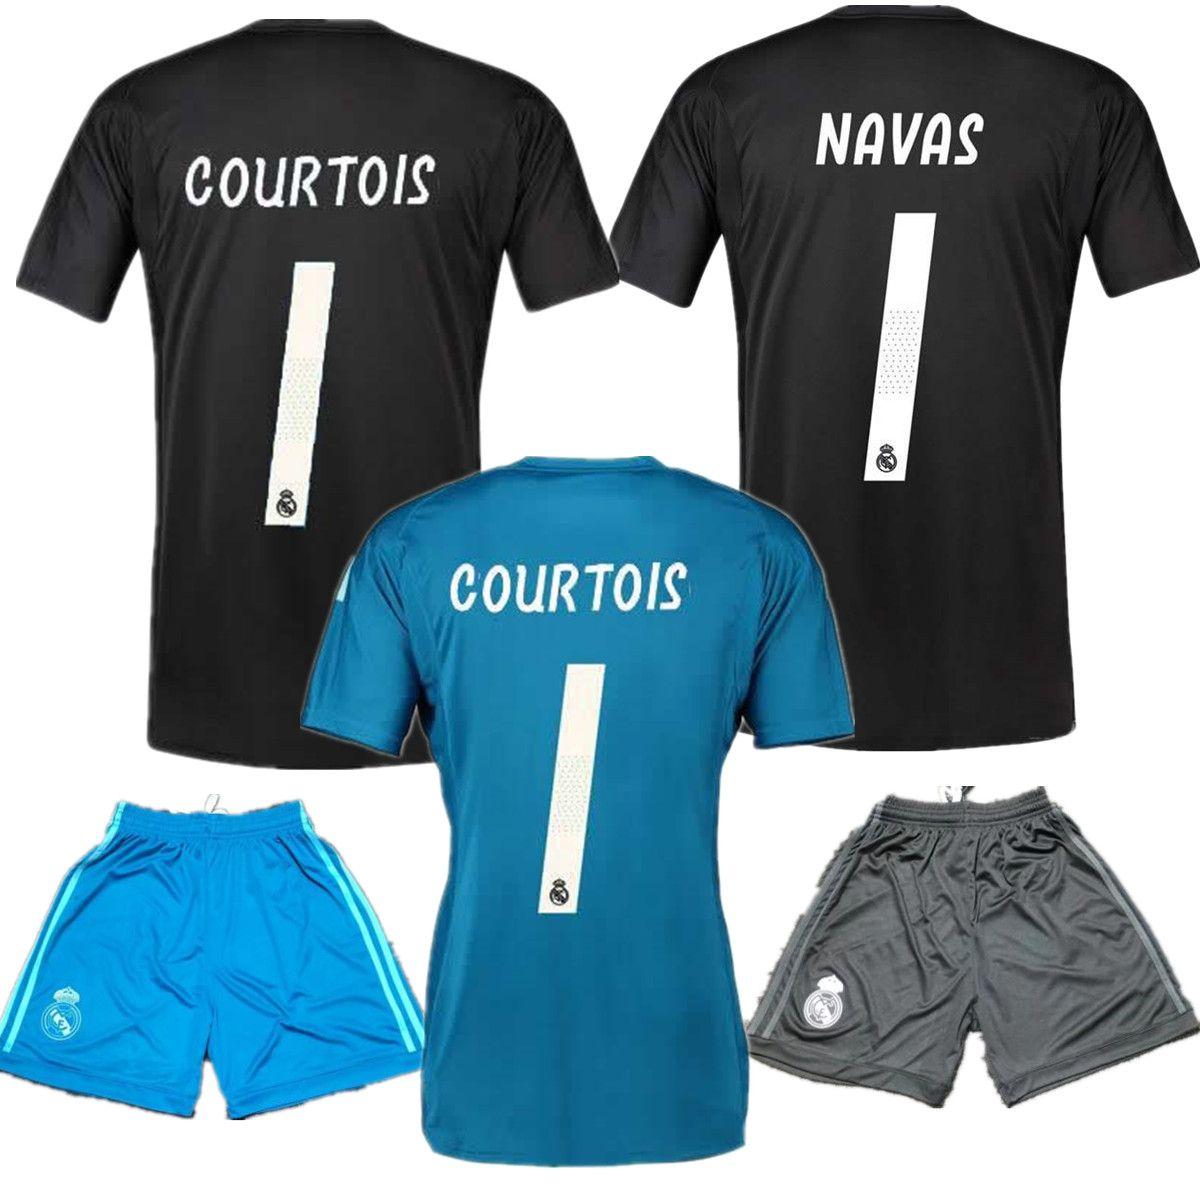 ba2383e799 Compre 18 19 Real Madrid   13 Courtois Camisolas De Guarda Redes 1 Keylor  Navas Jersey Camiseta Curtas 2018 19 13 Thibaut Courtois Madrid Azul Negro  Guarda ...